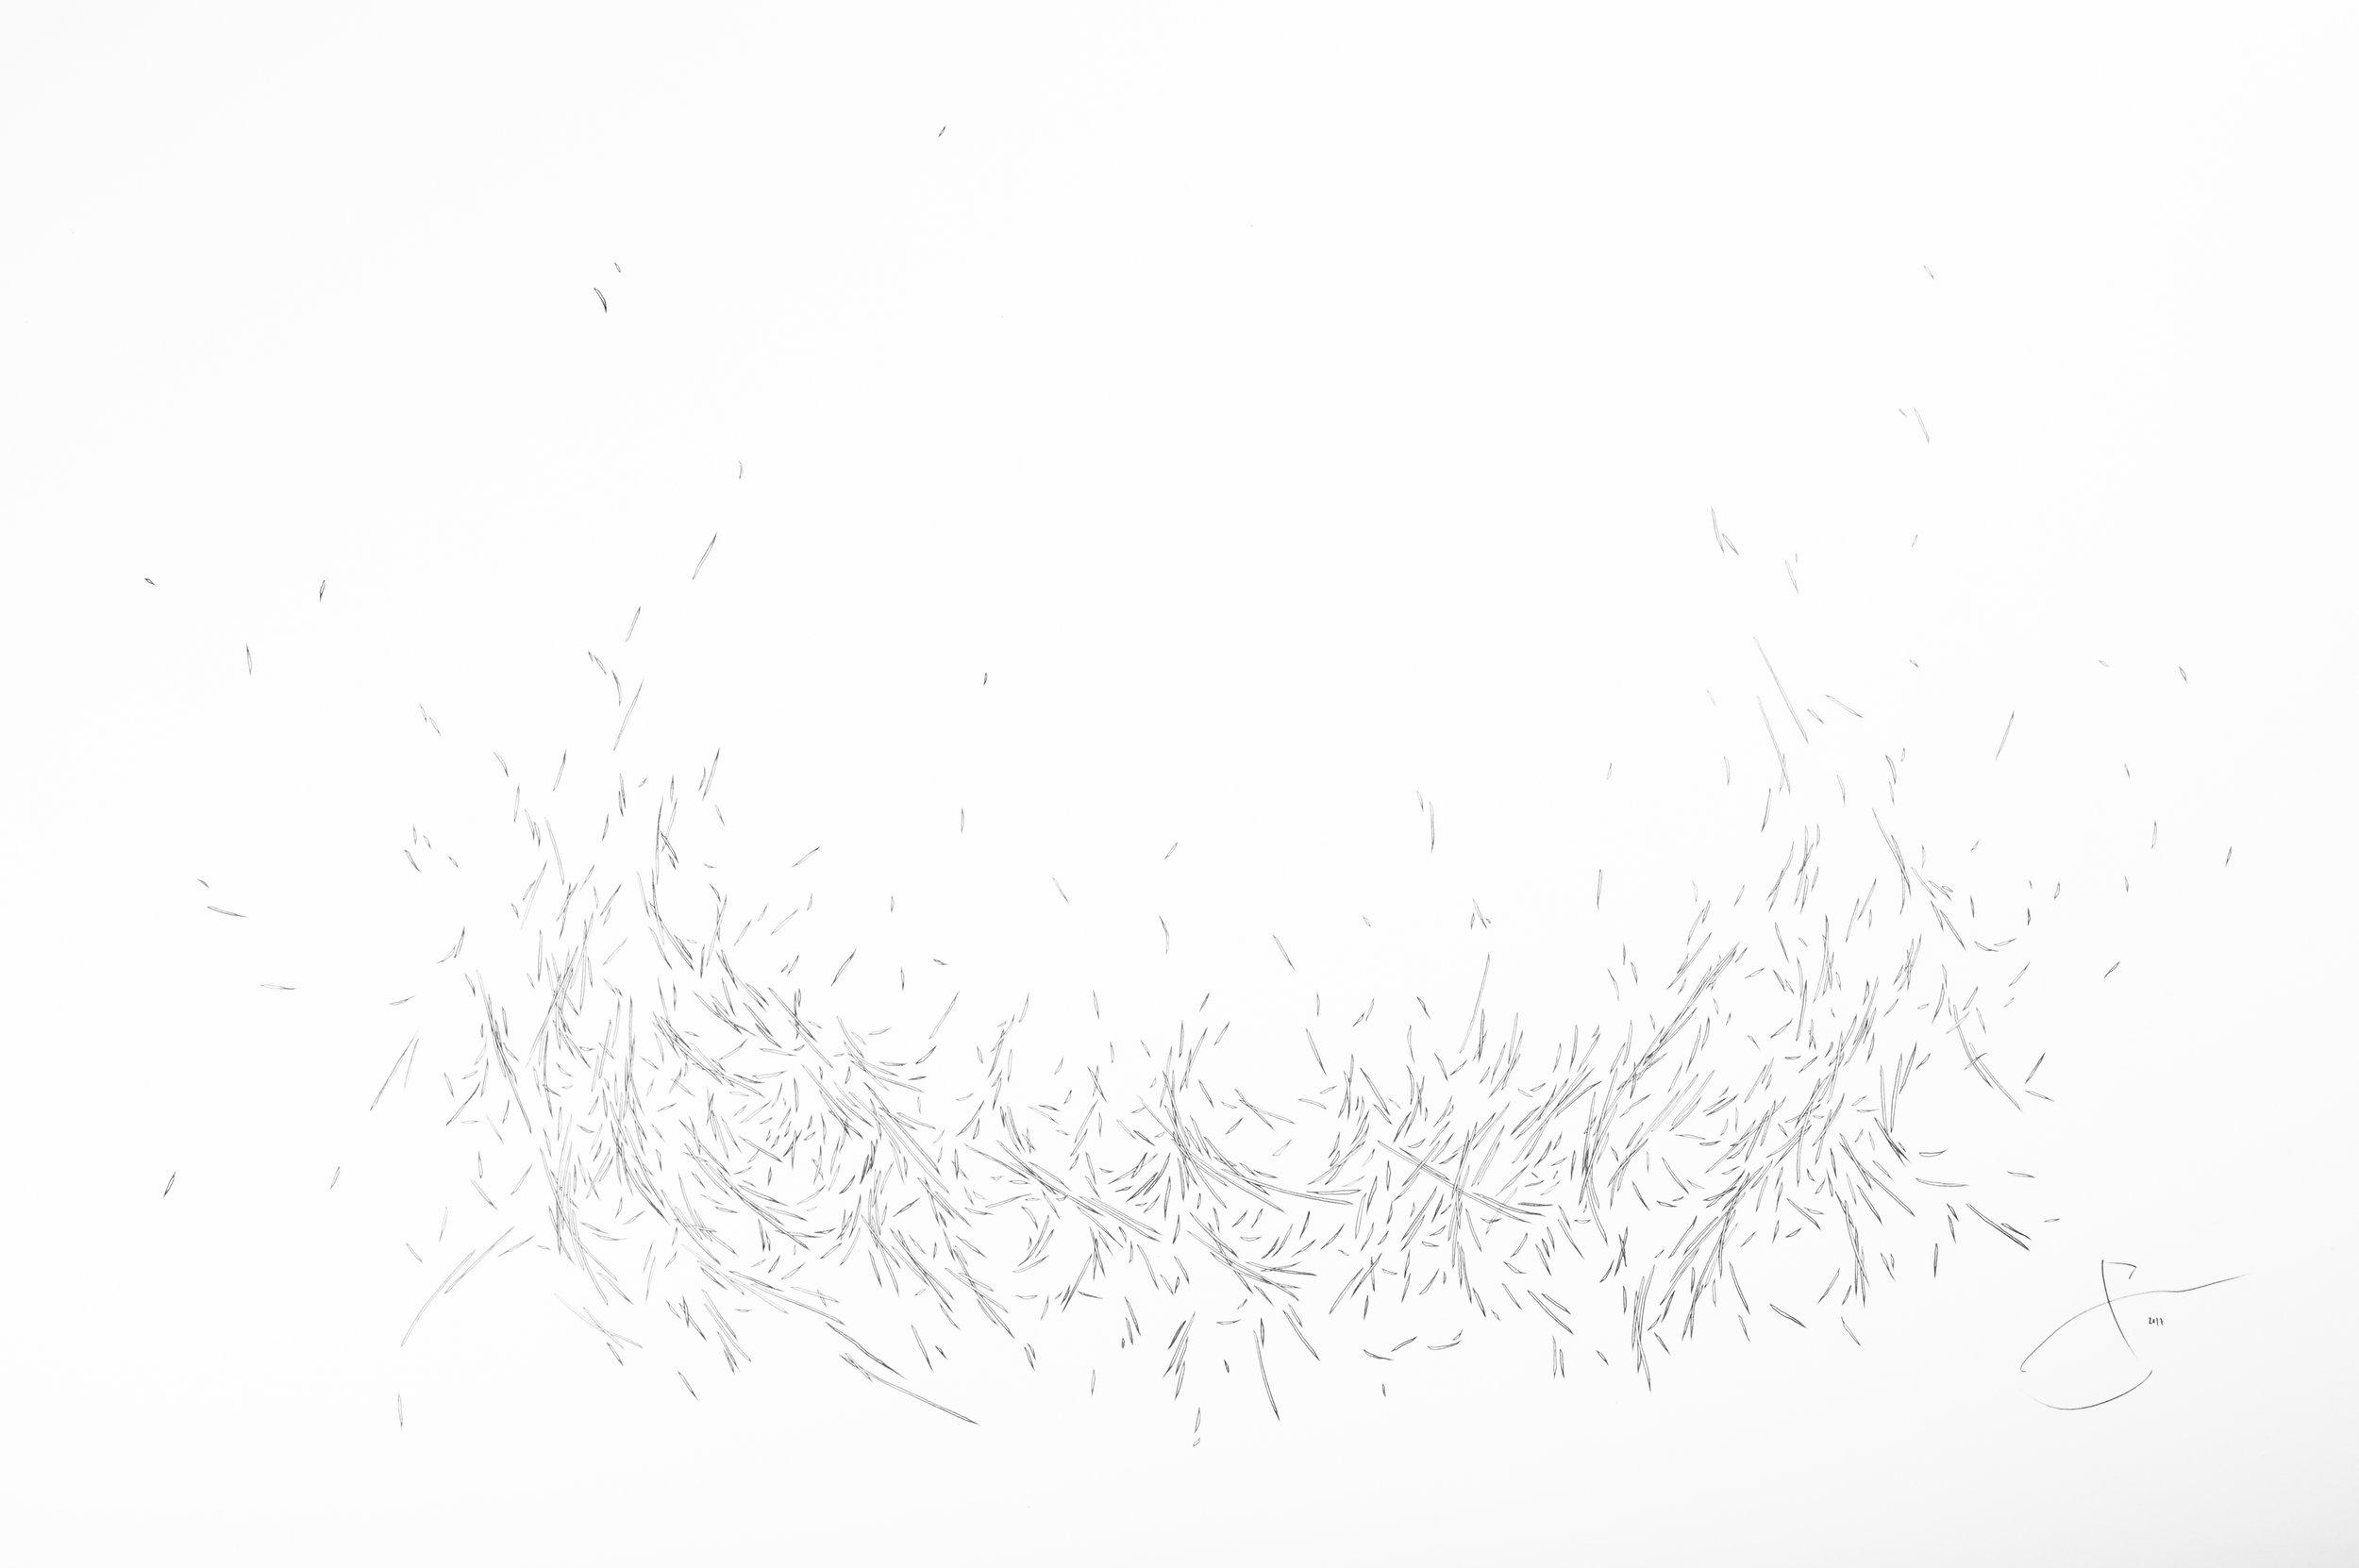 LIFE-Ayo-Sopeju-art-full-size